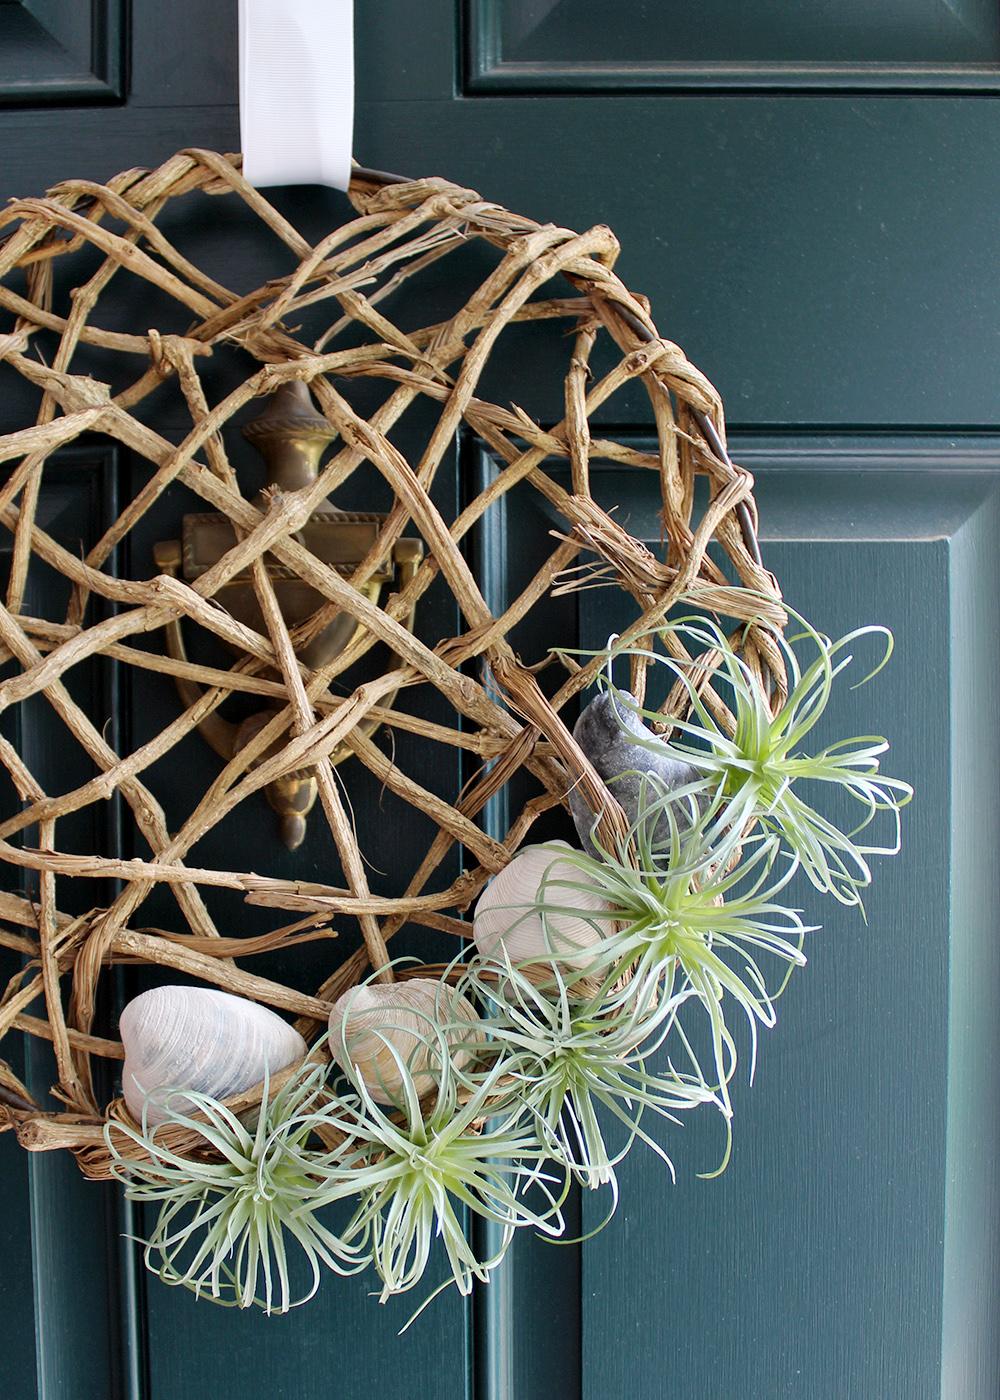 make an air plant wreath with seashells for $25 #summerDIY #creativewreath